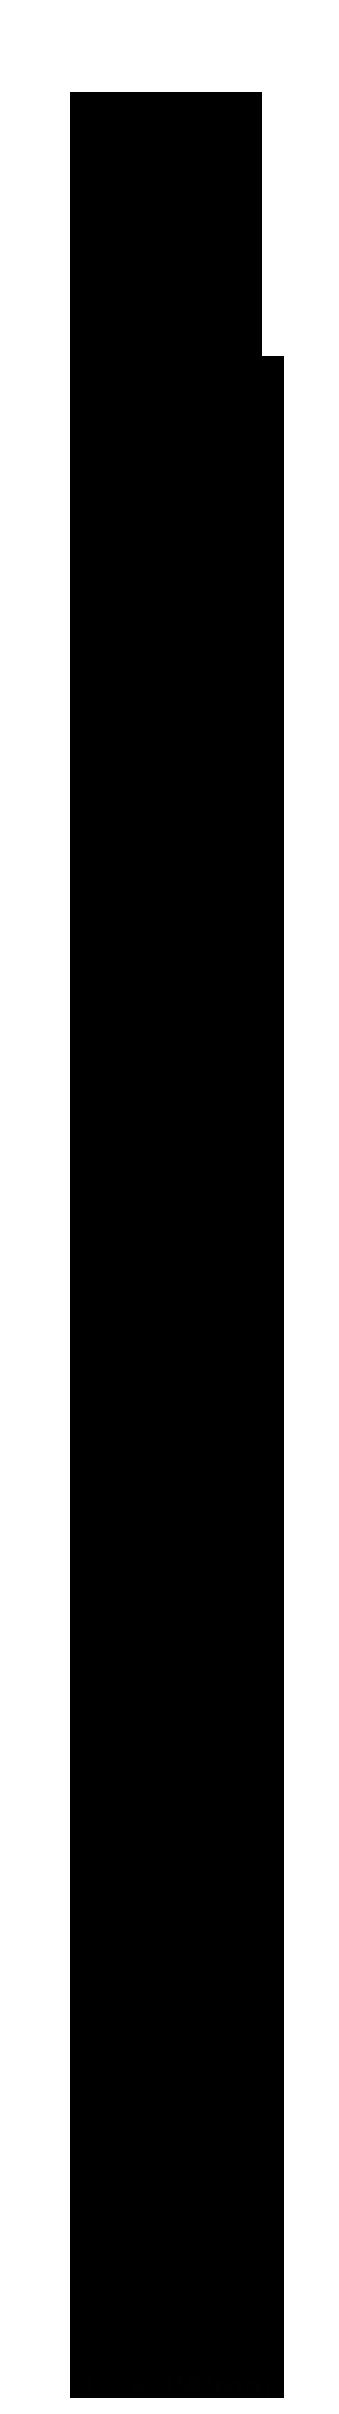 York MDF Primed Skirting Board 18mm Profile